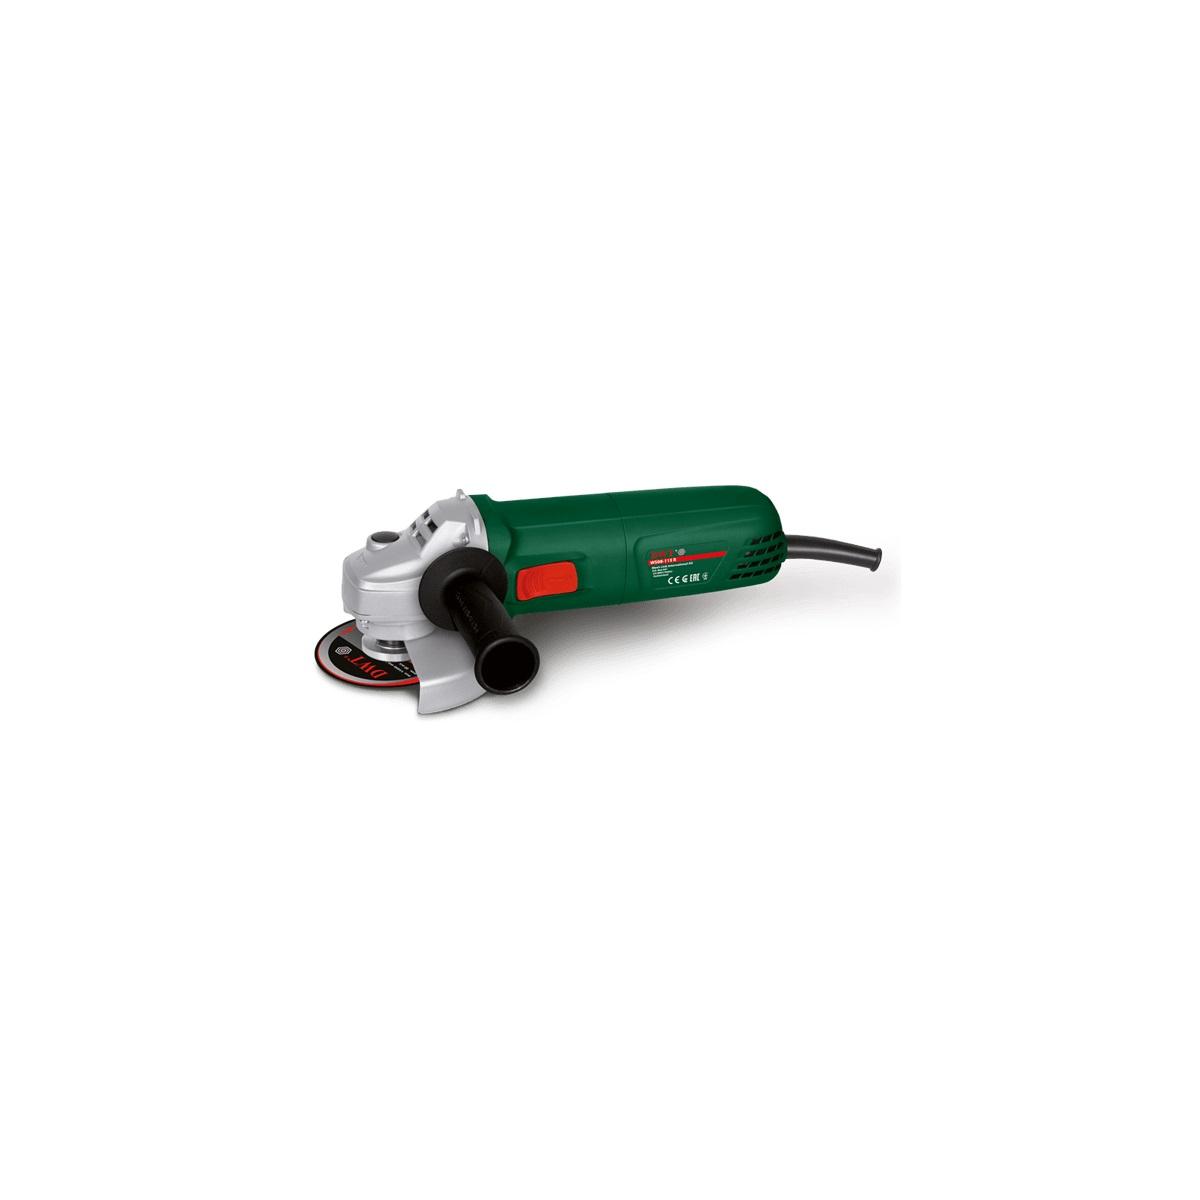 DWT WS08-115R, elektrická úhlová bruska 115 mm